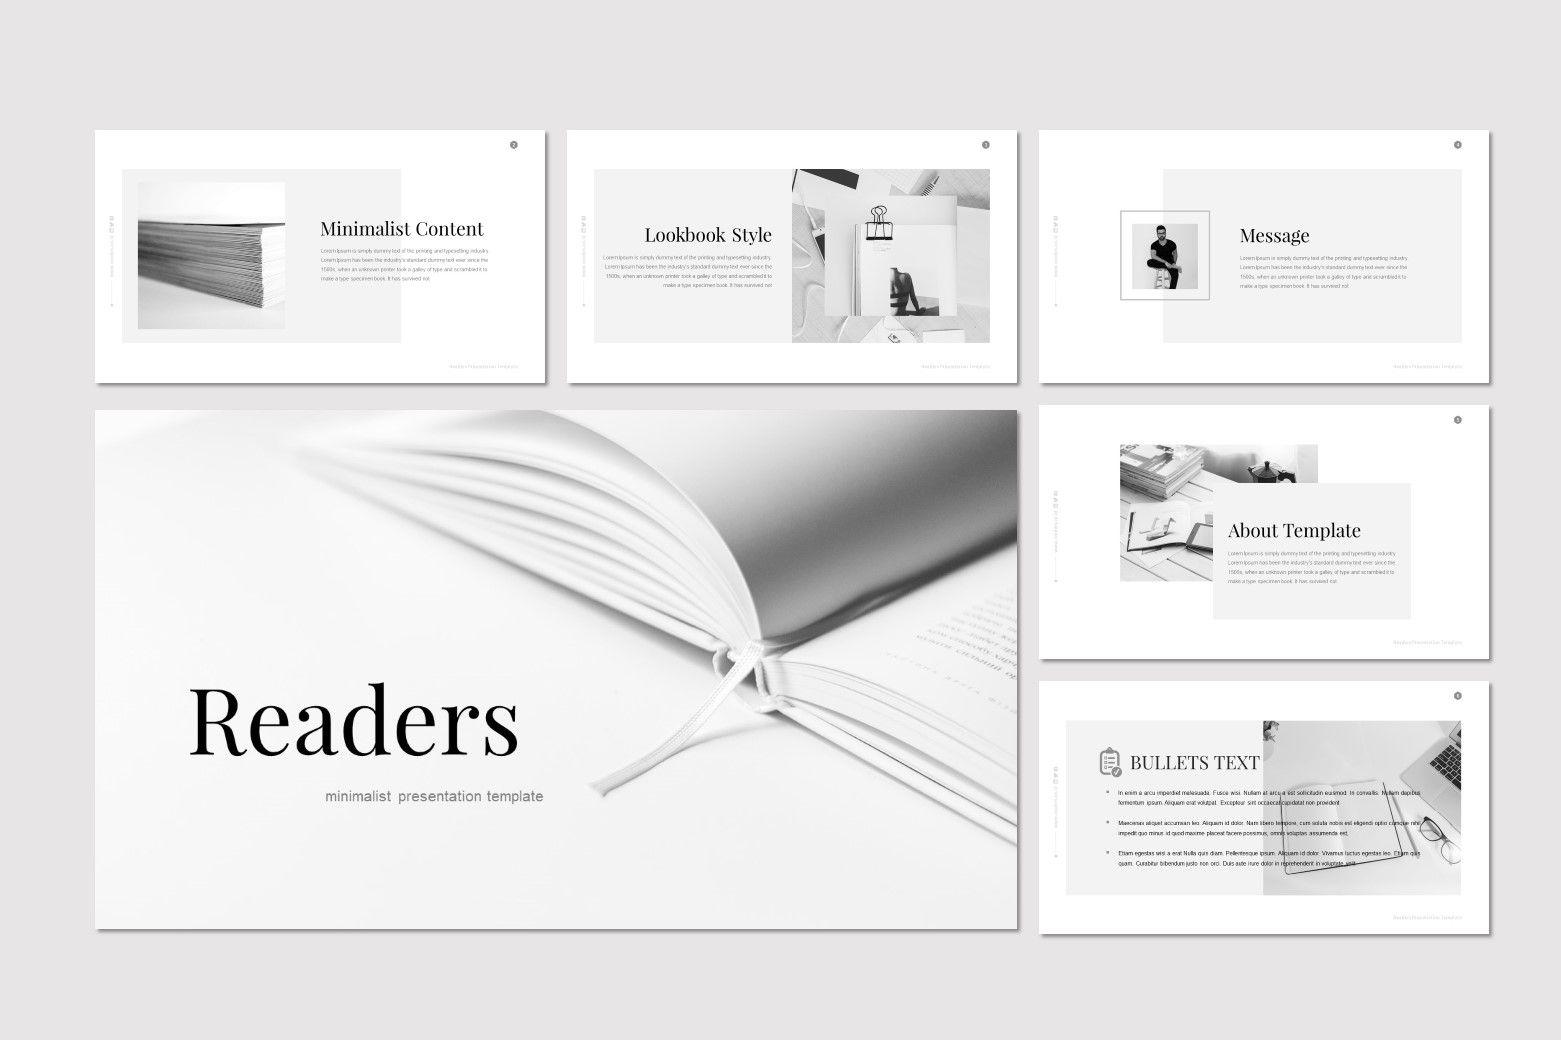 Readers - PowerPoint Template, Slide 2, 07204, Presentation Templates — PoweredTemplate.com